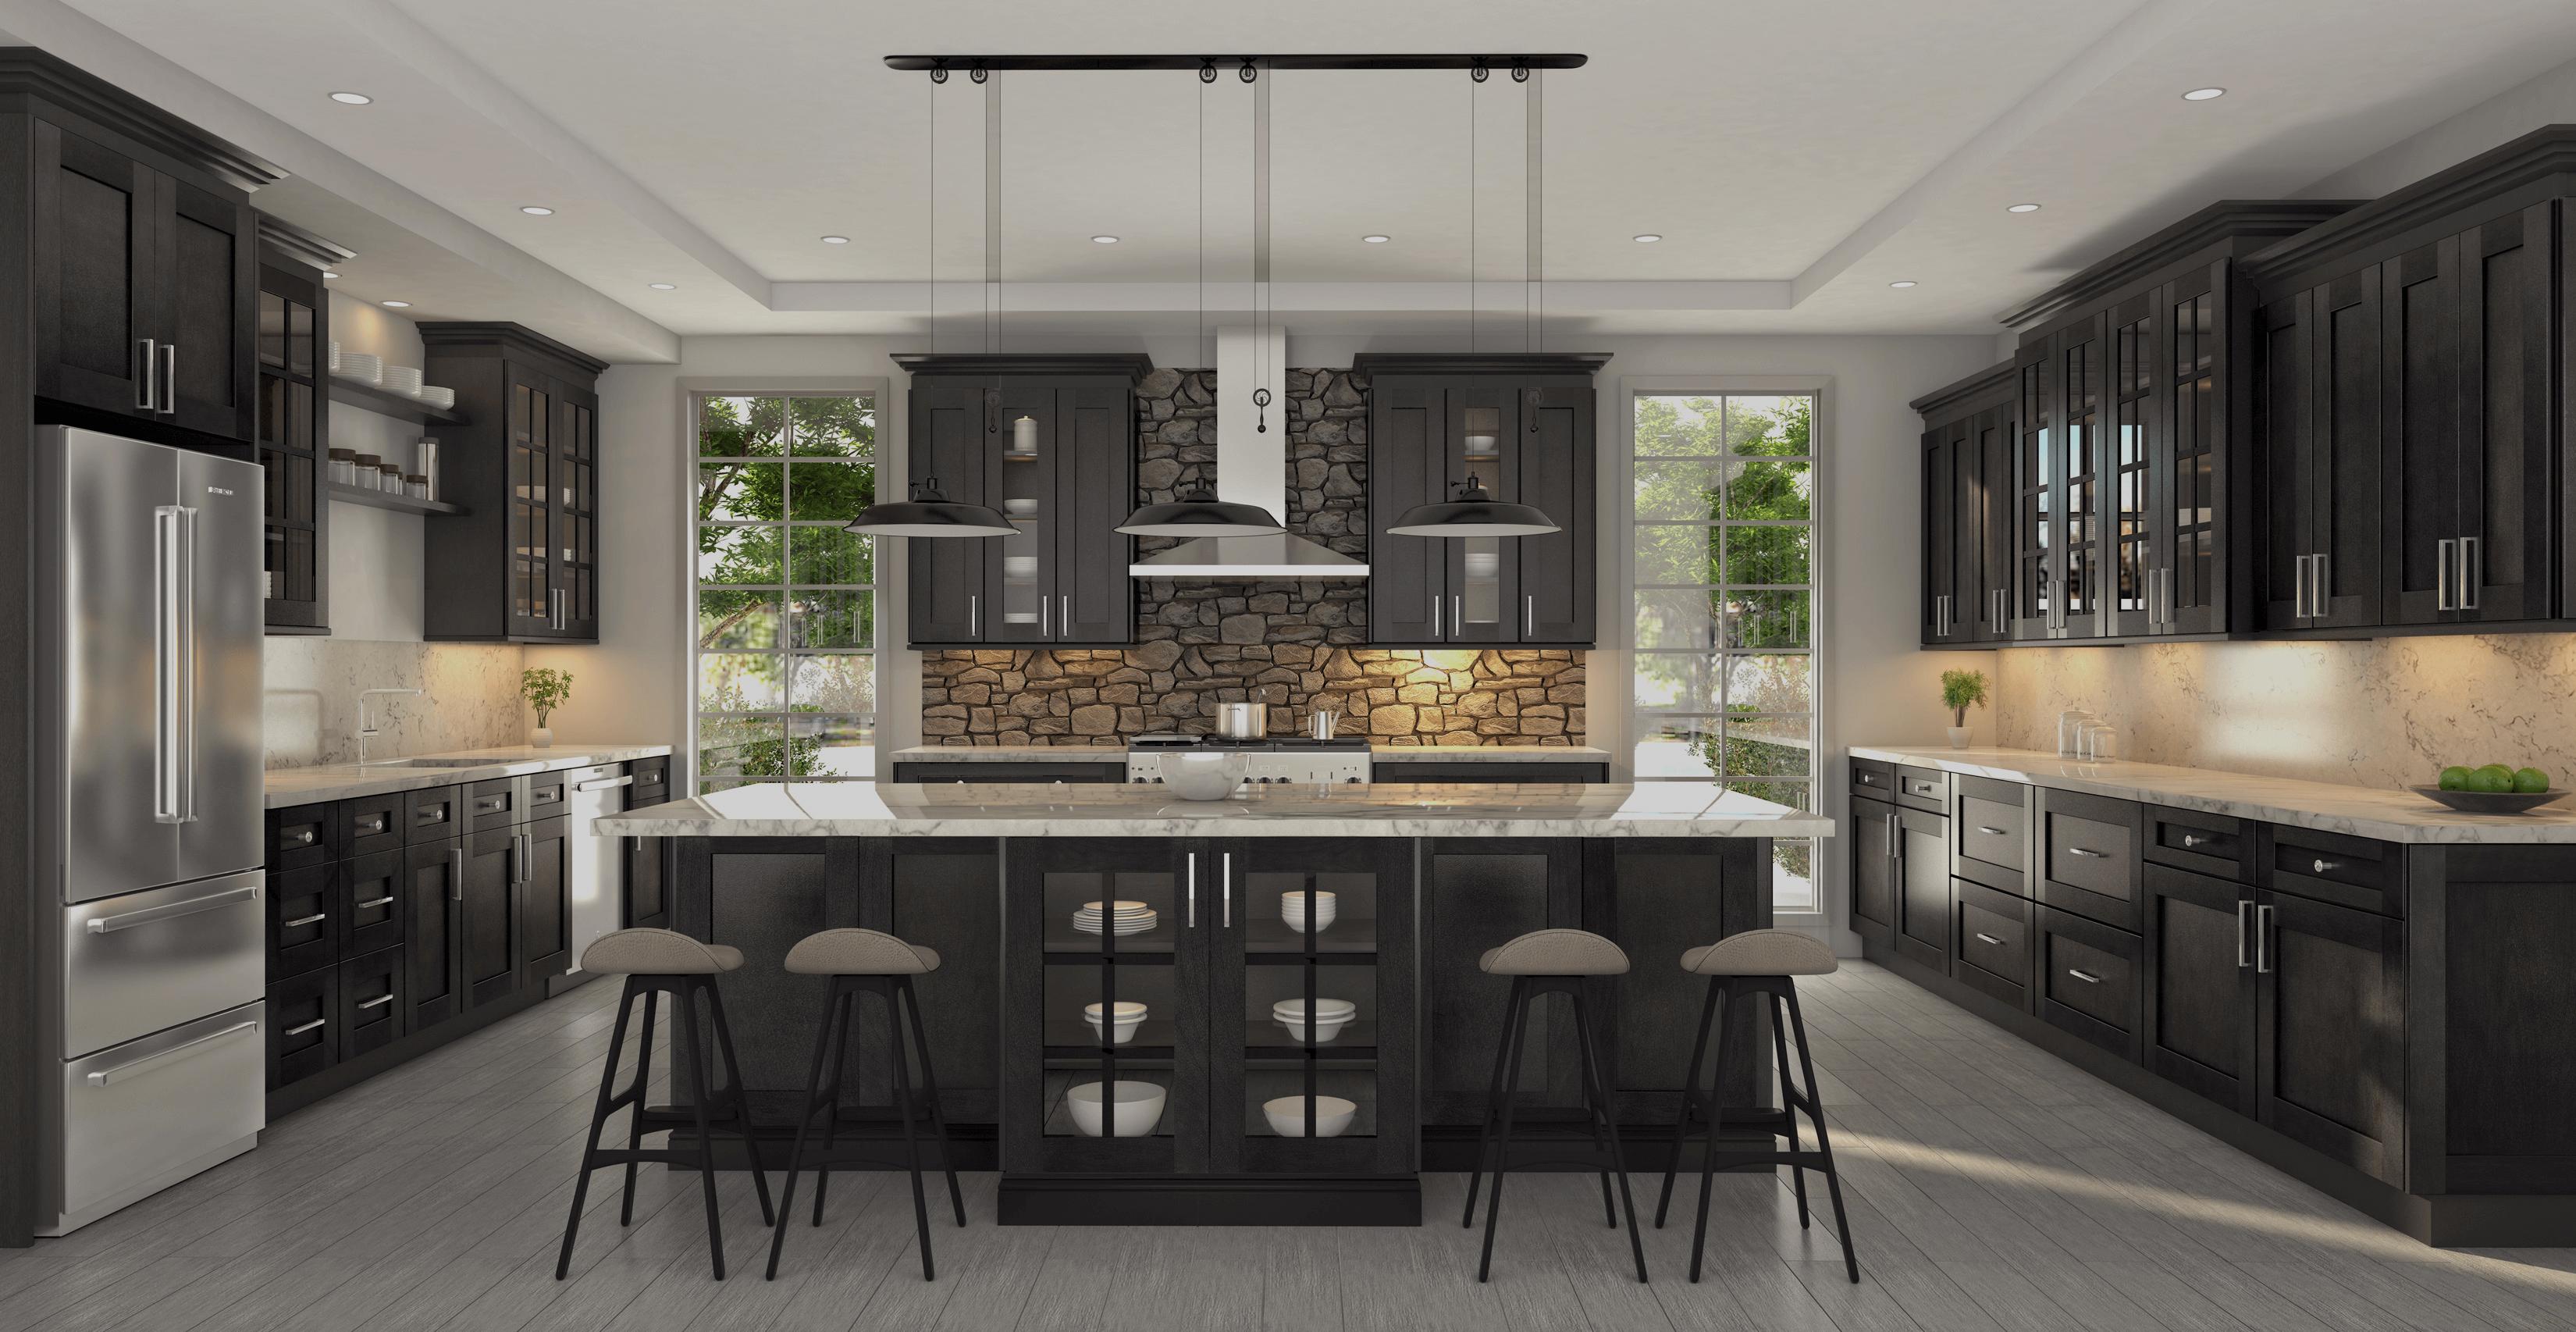 dover shale black classic kitchen cabinets